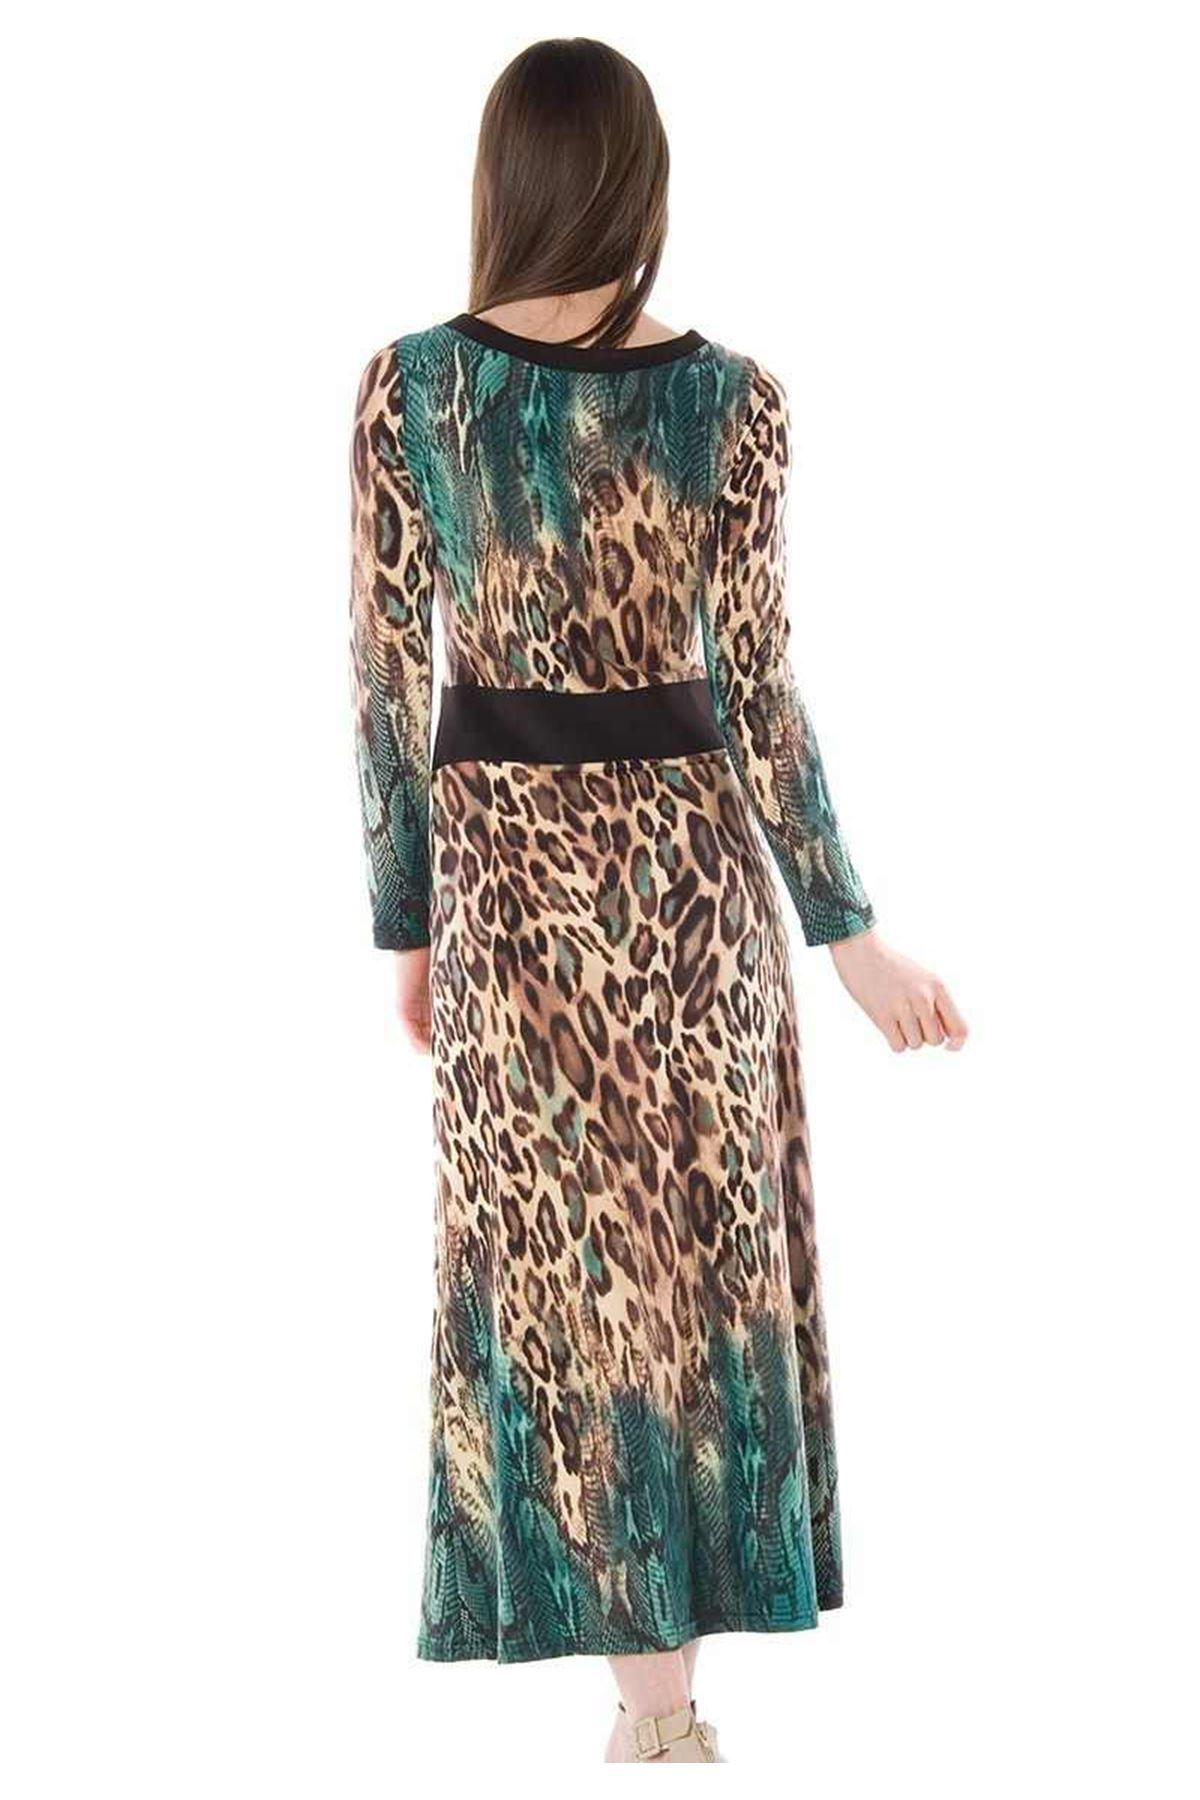 Leopar Desenli Uzun Elbise G1-67337